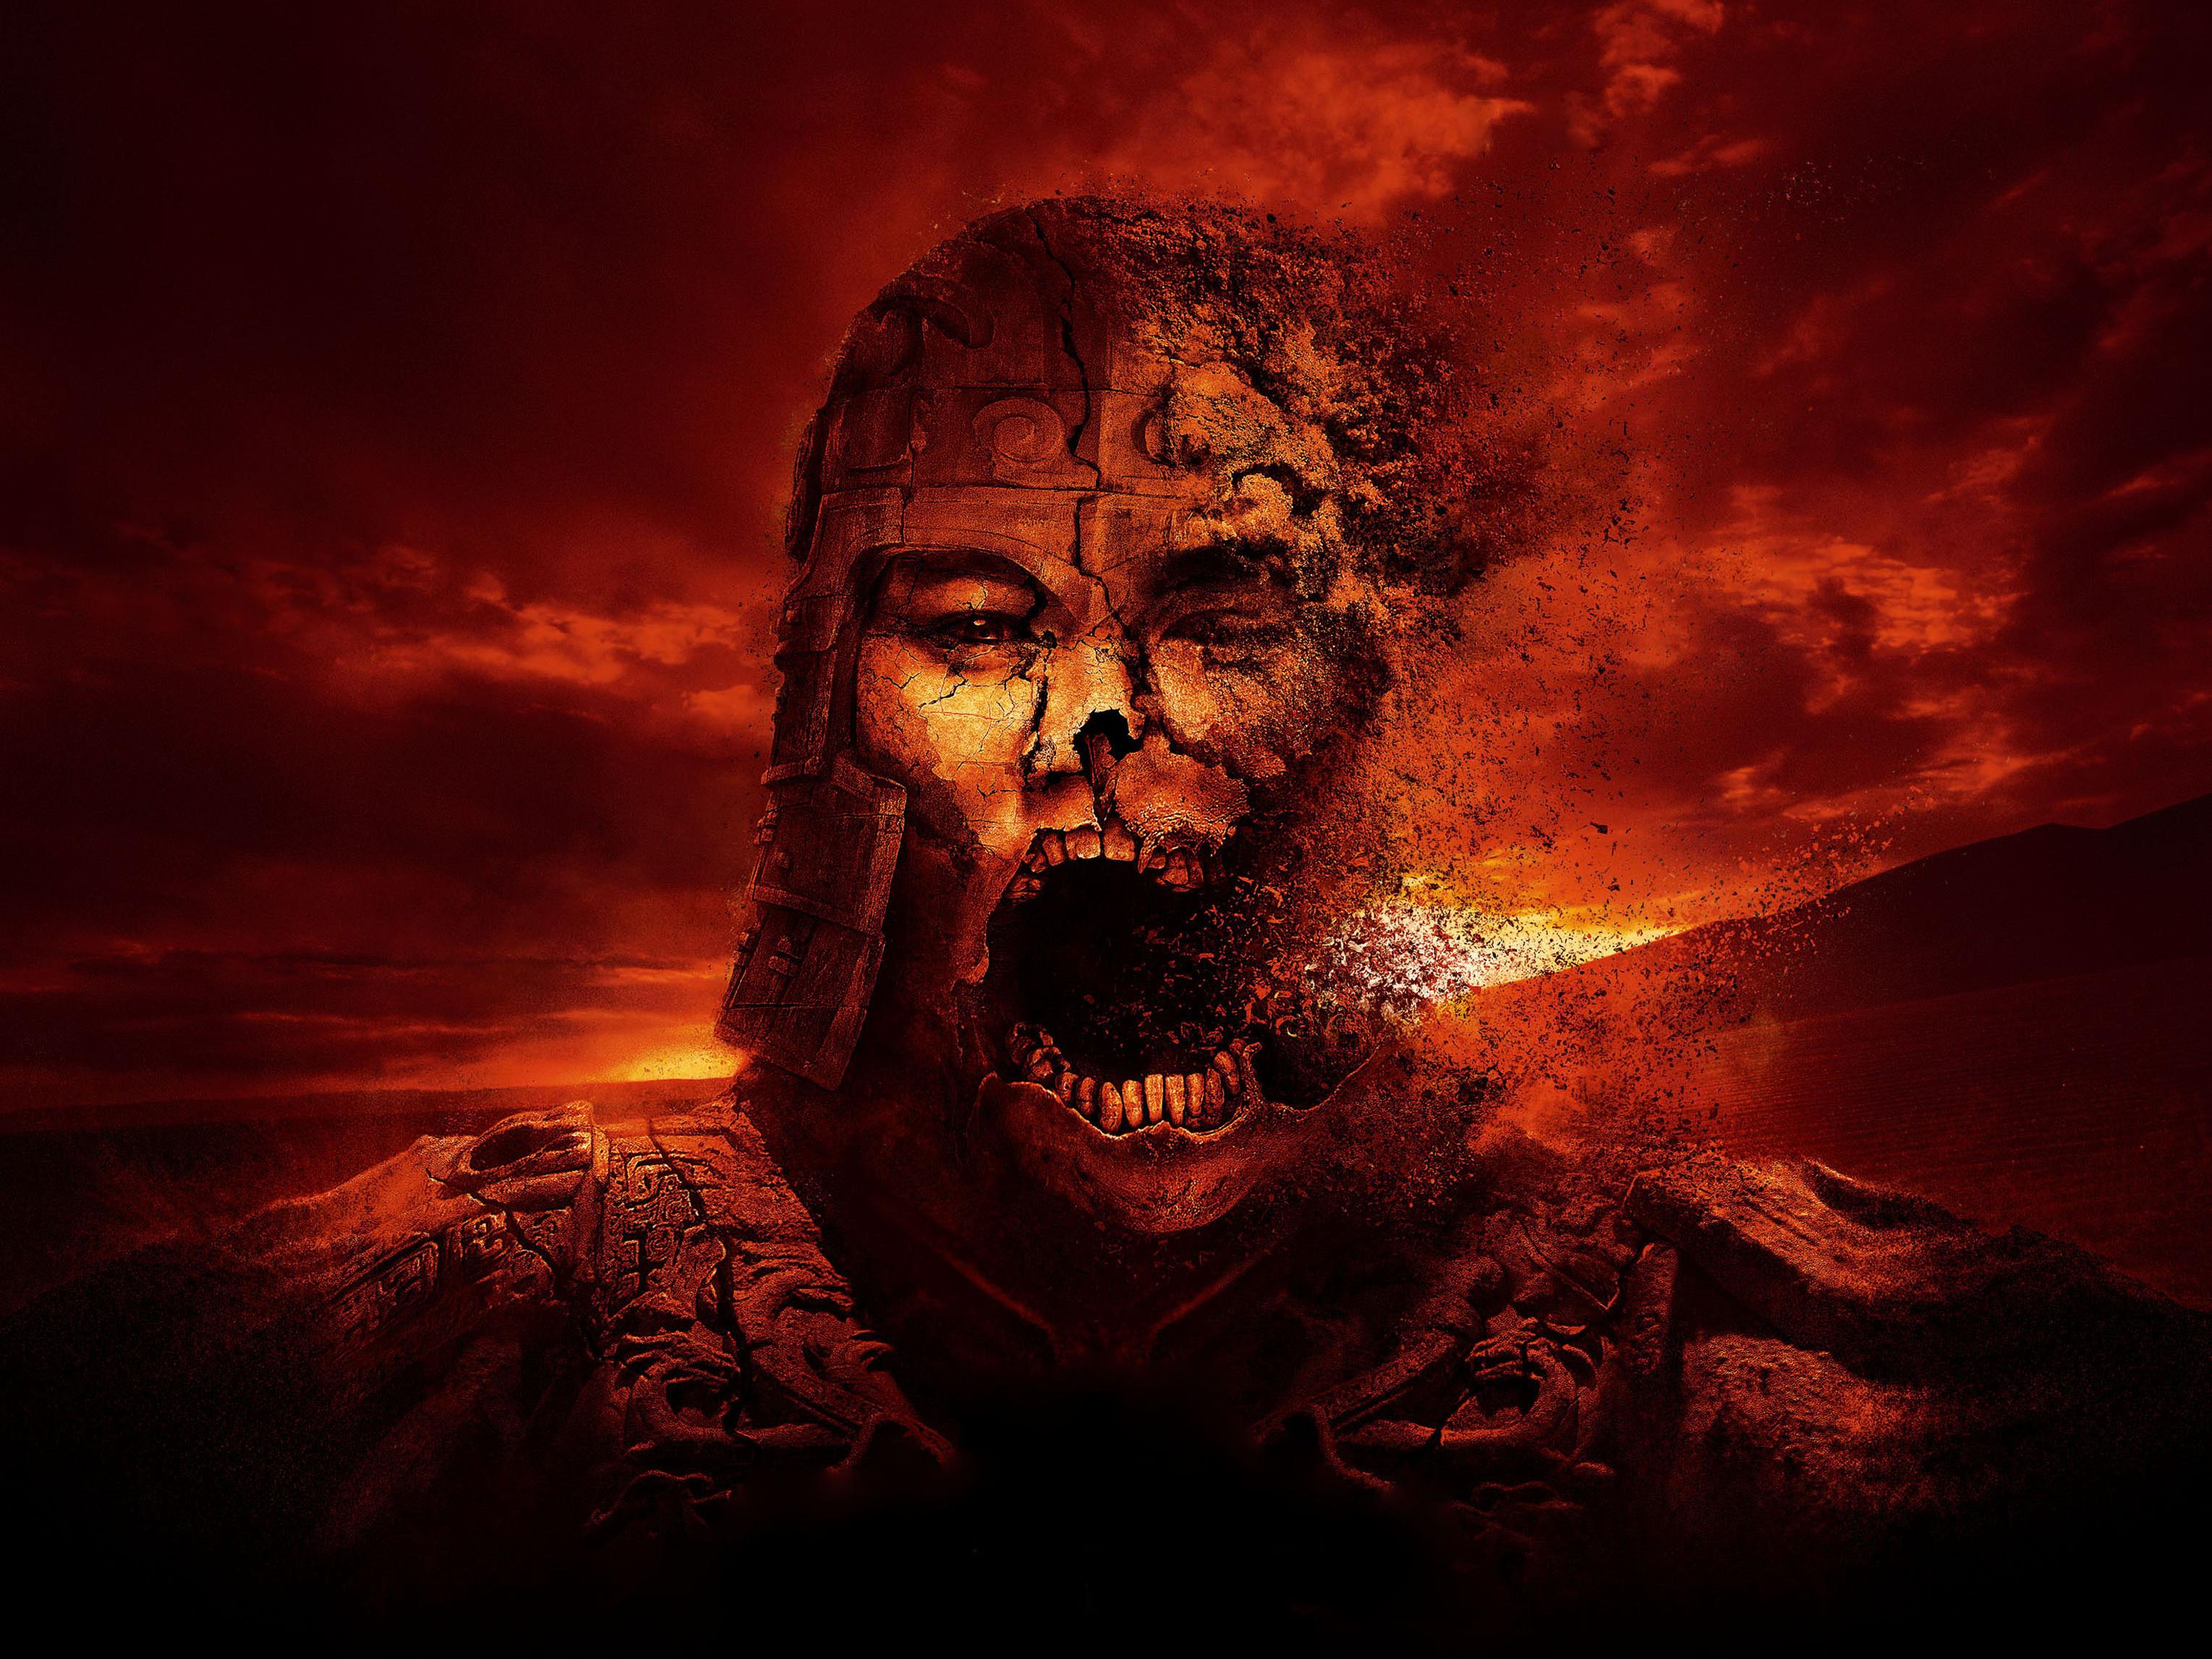 Wallpaper The Mummy 2017 Movies Hd Movies 4142: The Mummy Wallpaper